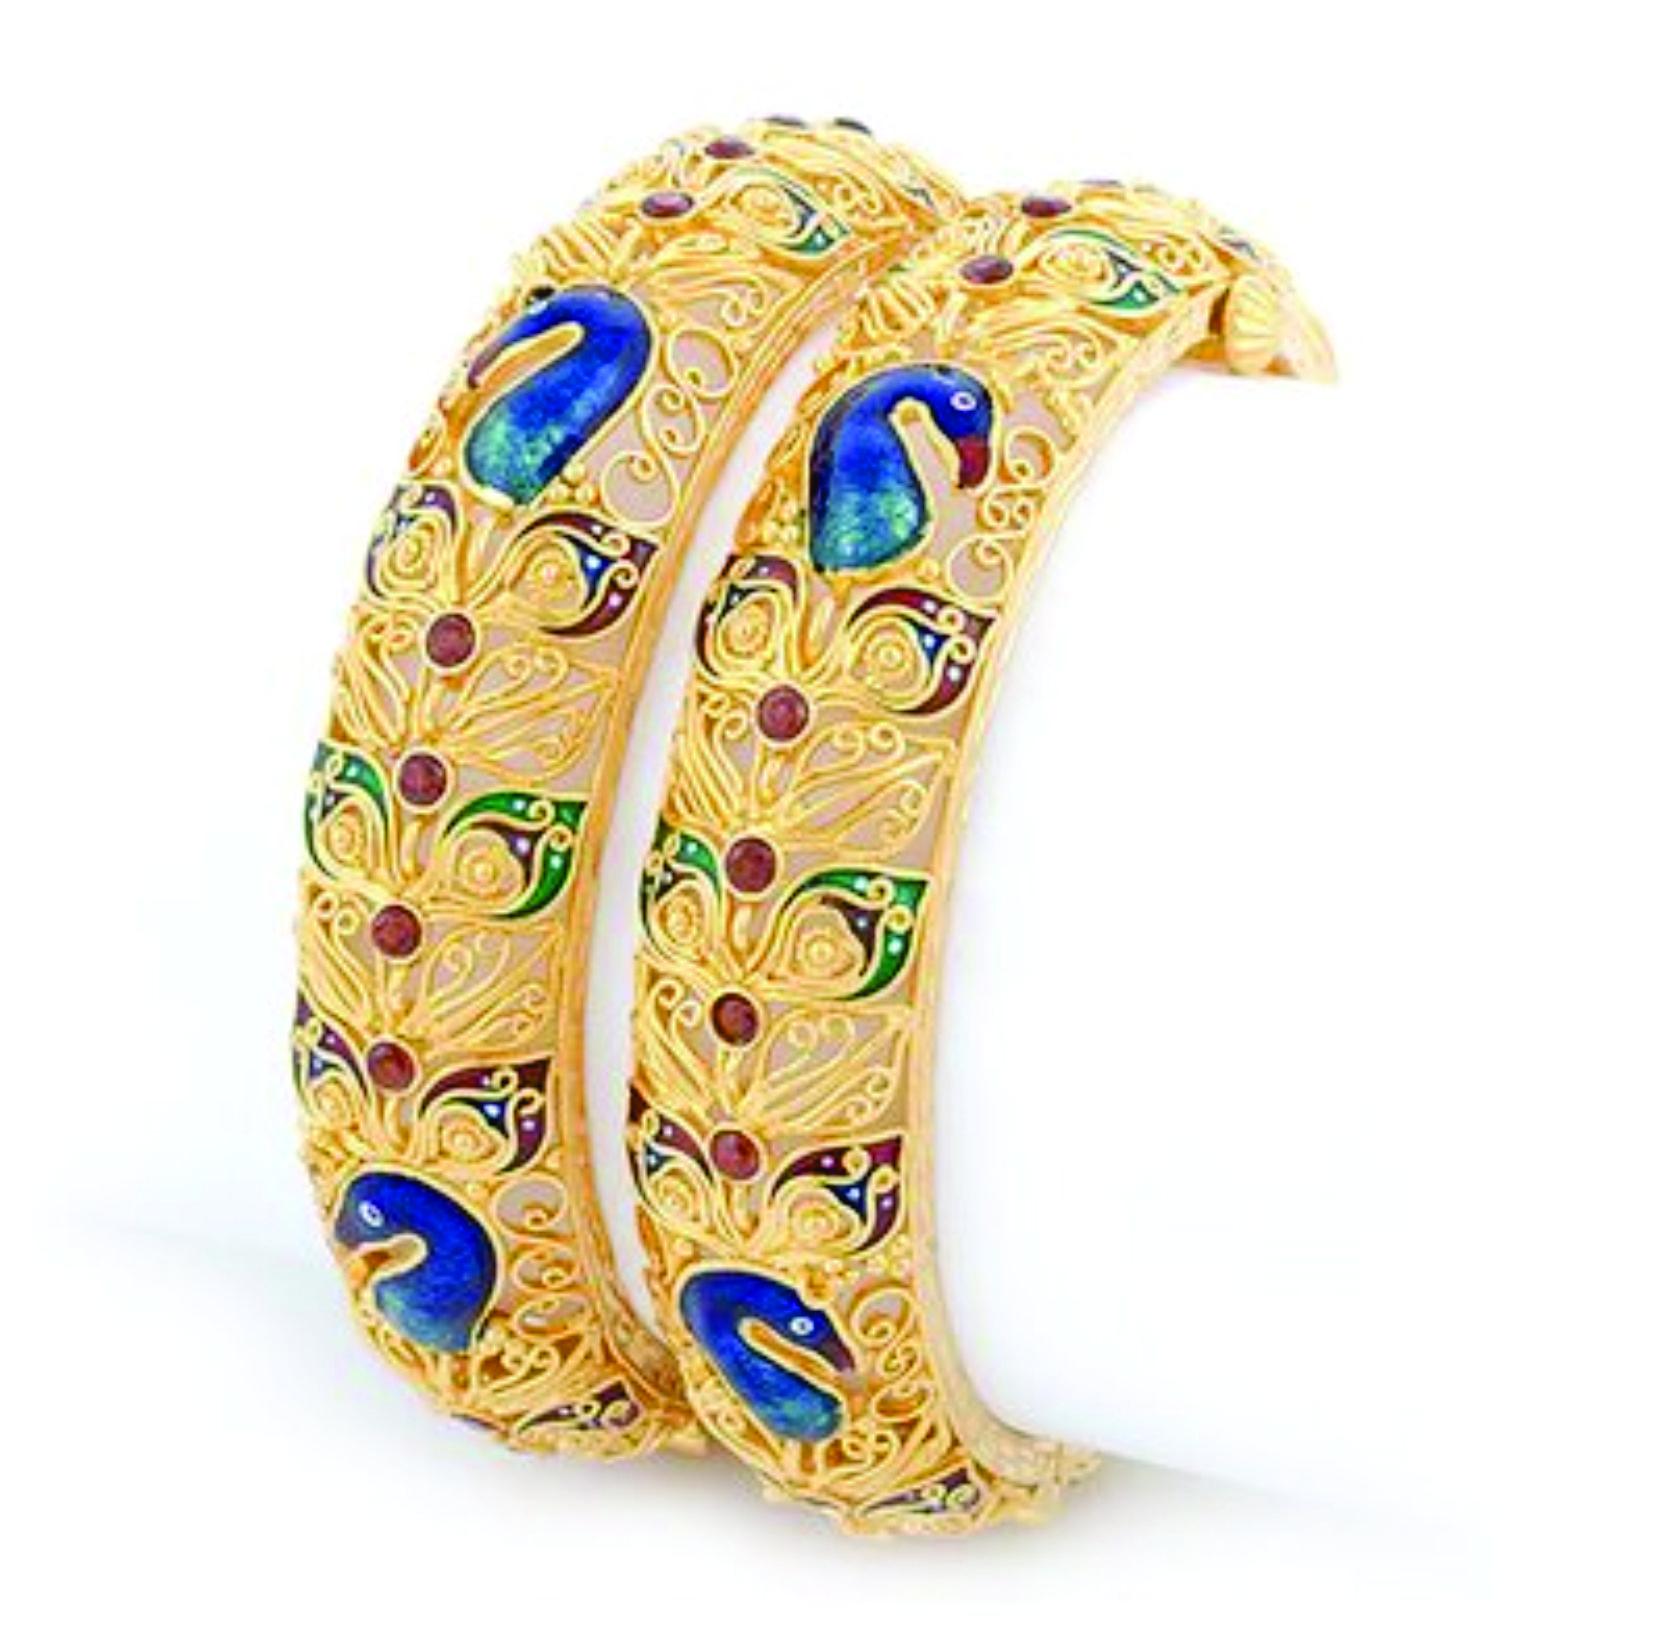 Fresh Kolkata Gold Jewellery Designs | Jewellry\'s Website